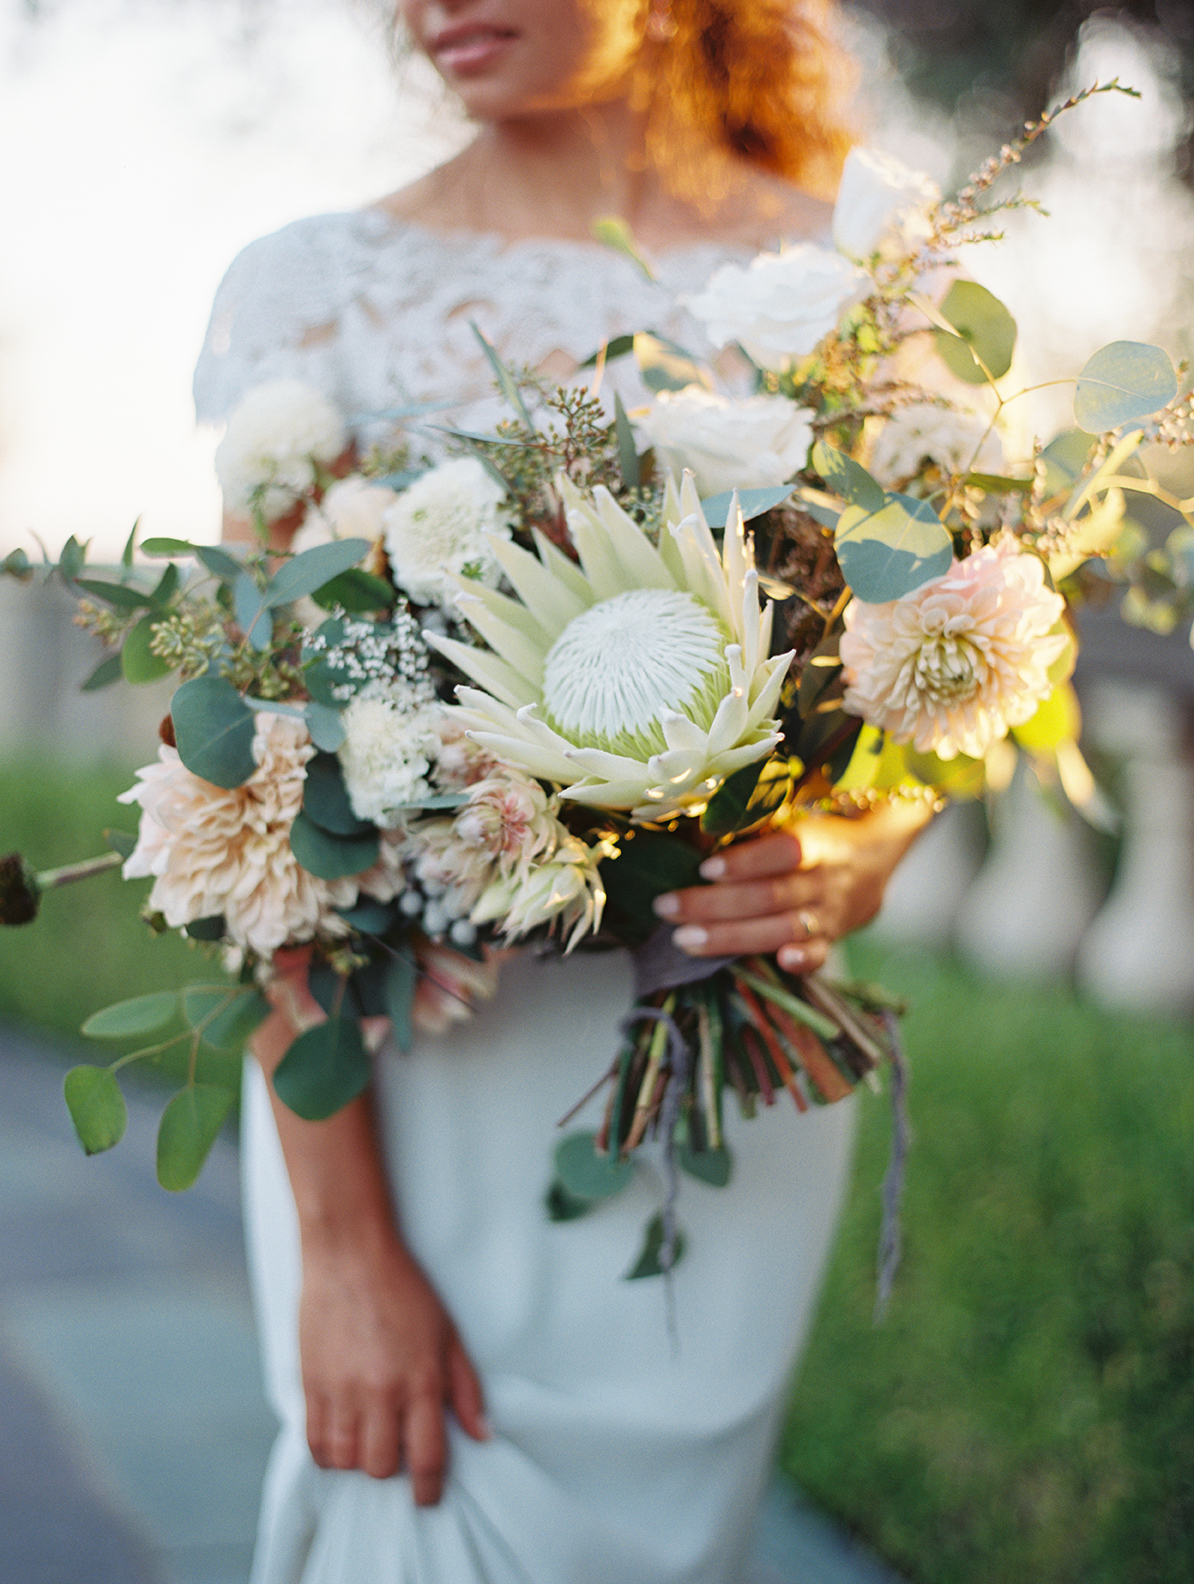 267-brian-sarra-los-angeles-wedding-brumley-wells-photography.jpg